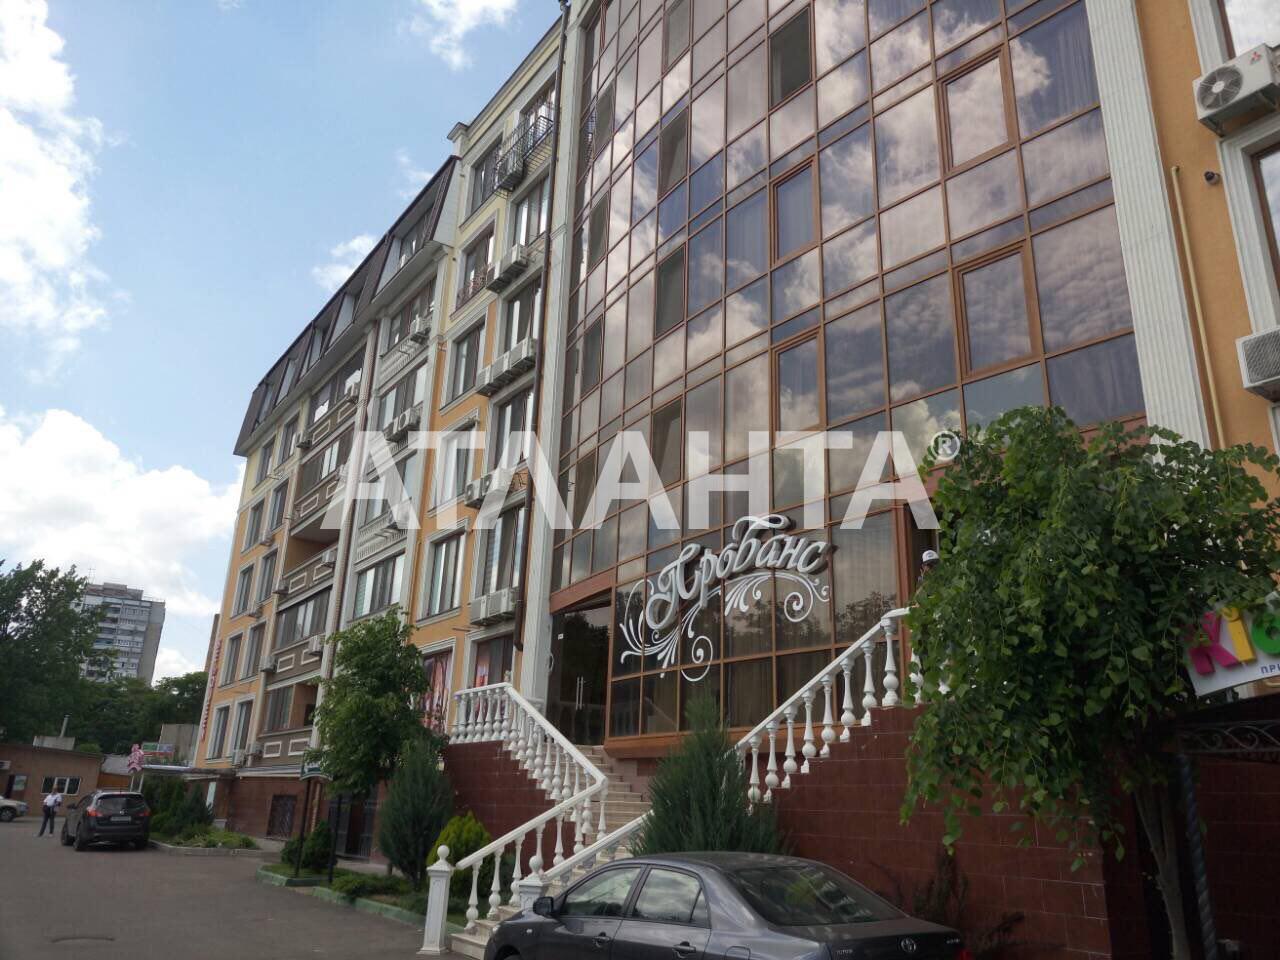 Продается 1-комнатная Квартира на ул. Говорова Марш. — 110 000 у.е. (фото №8)